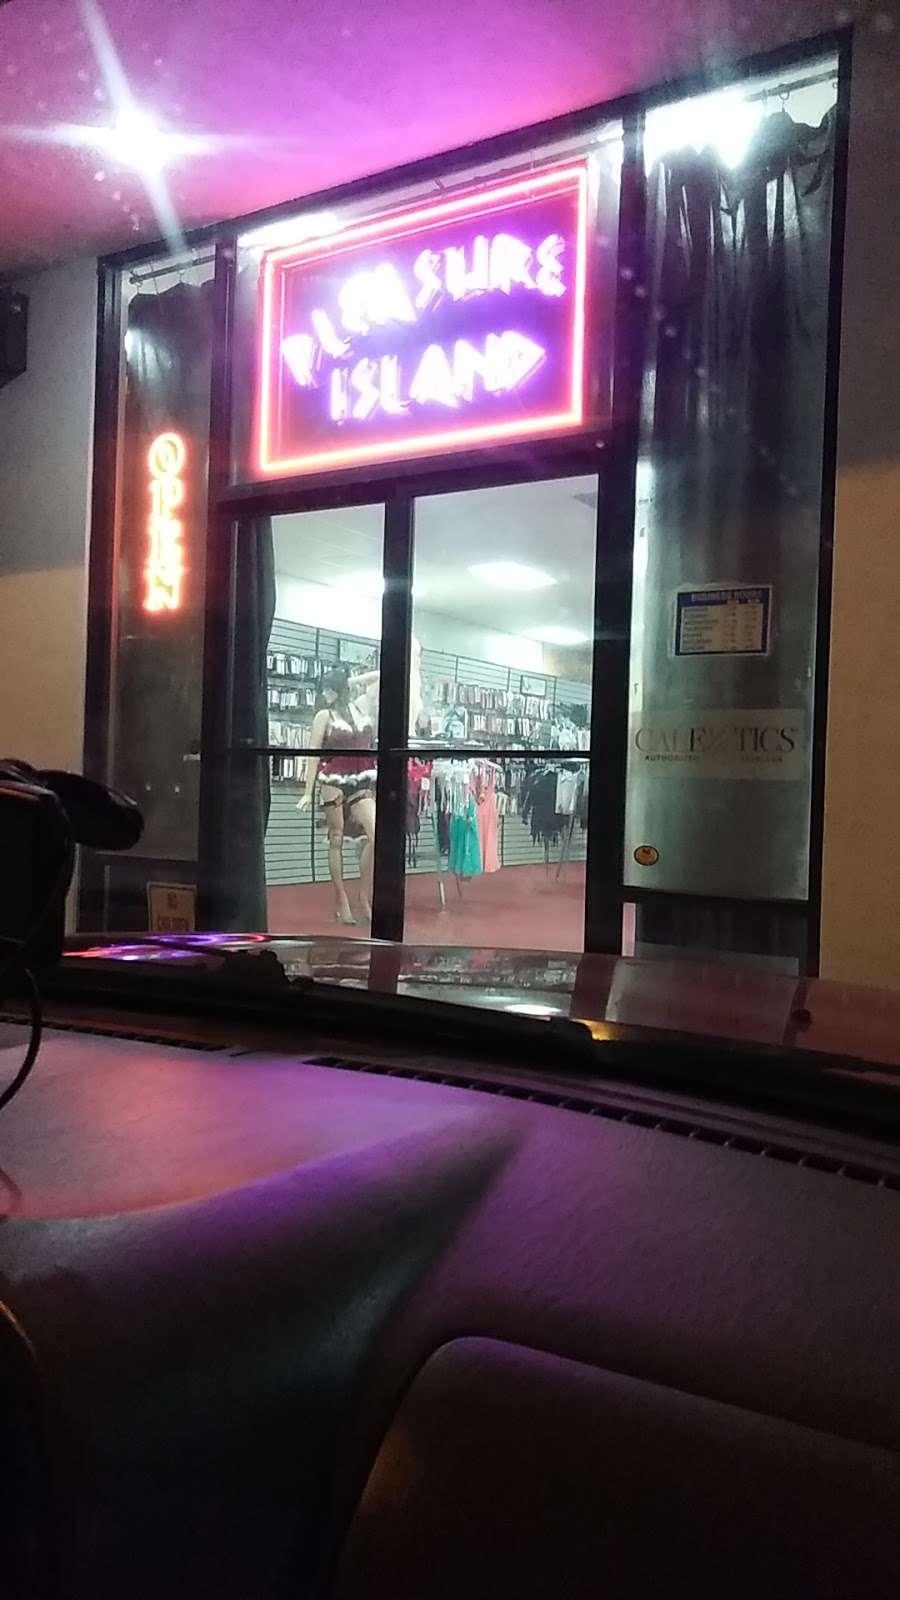 Pleasure Island - electronics store  | Photo 3 of 7 | Address: 18426 Hawthorne Blvd, Torrance, CA 90504, USA | Phone: (310) 793-9477